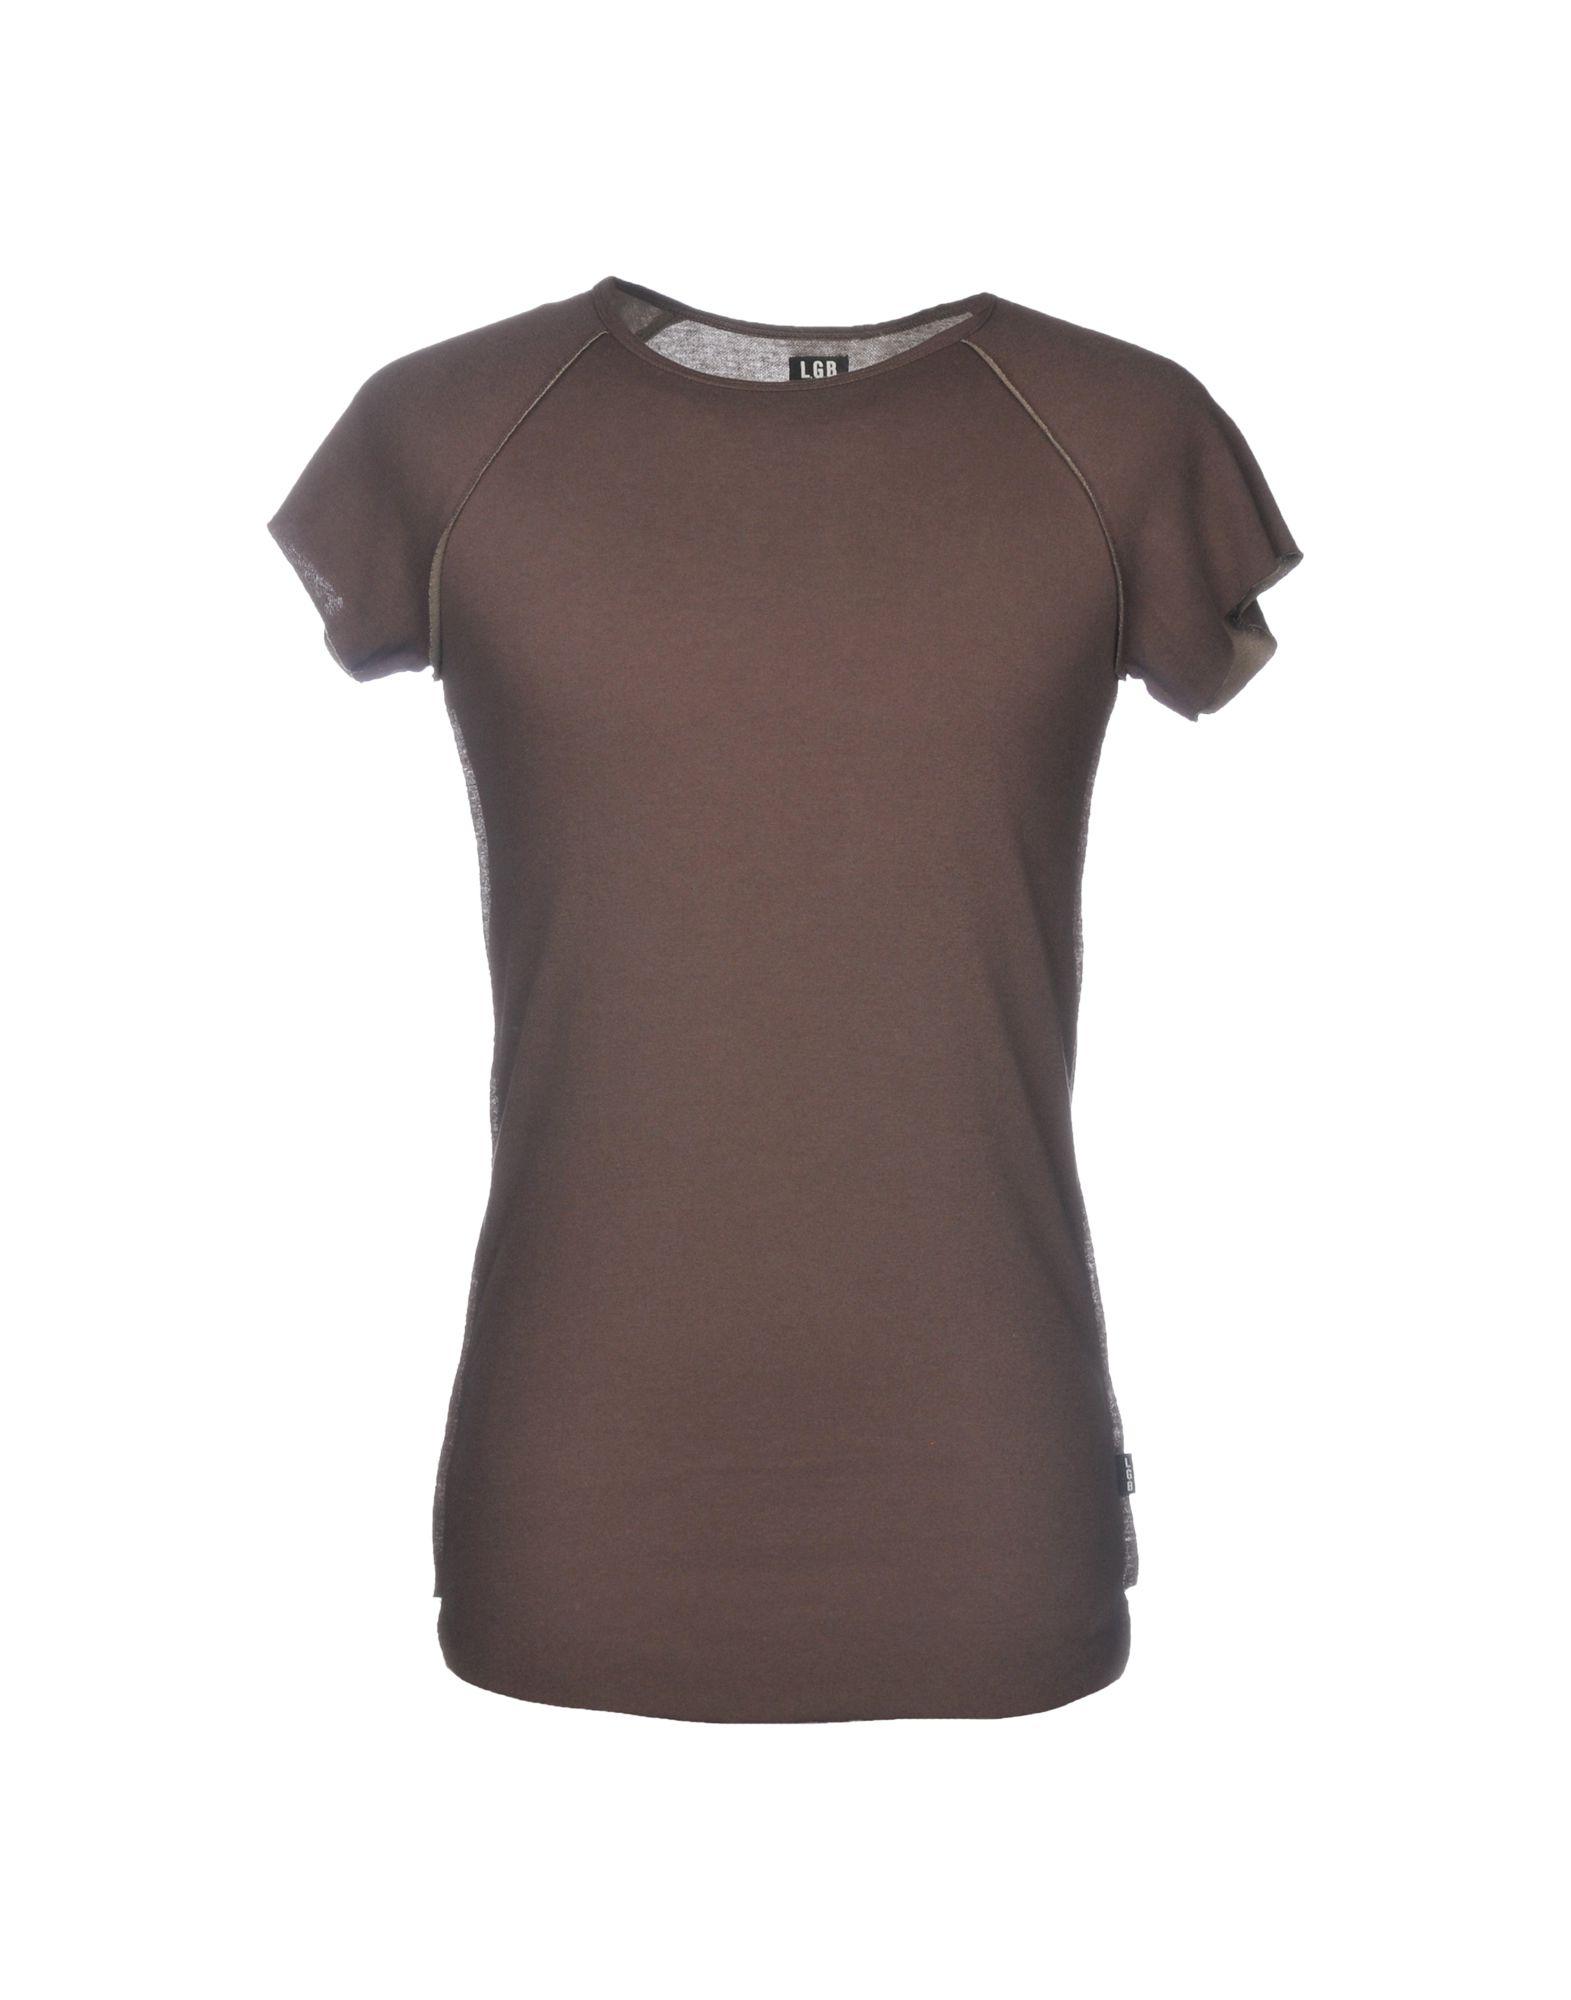 L.G.B. T-Shirt in Light Brown